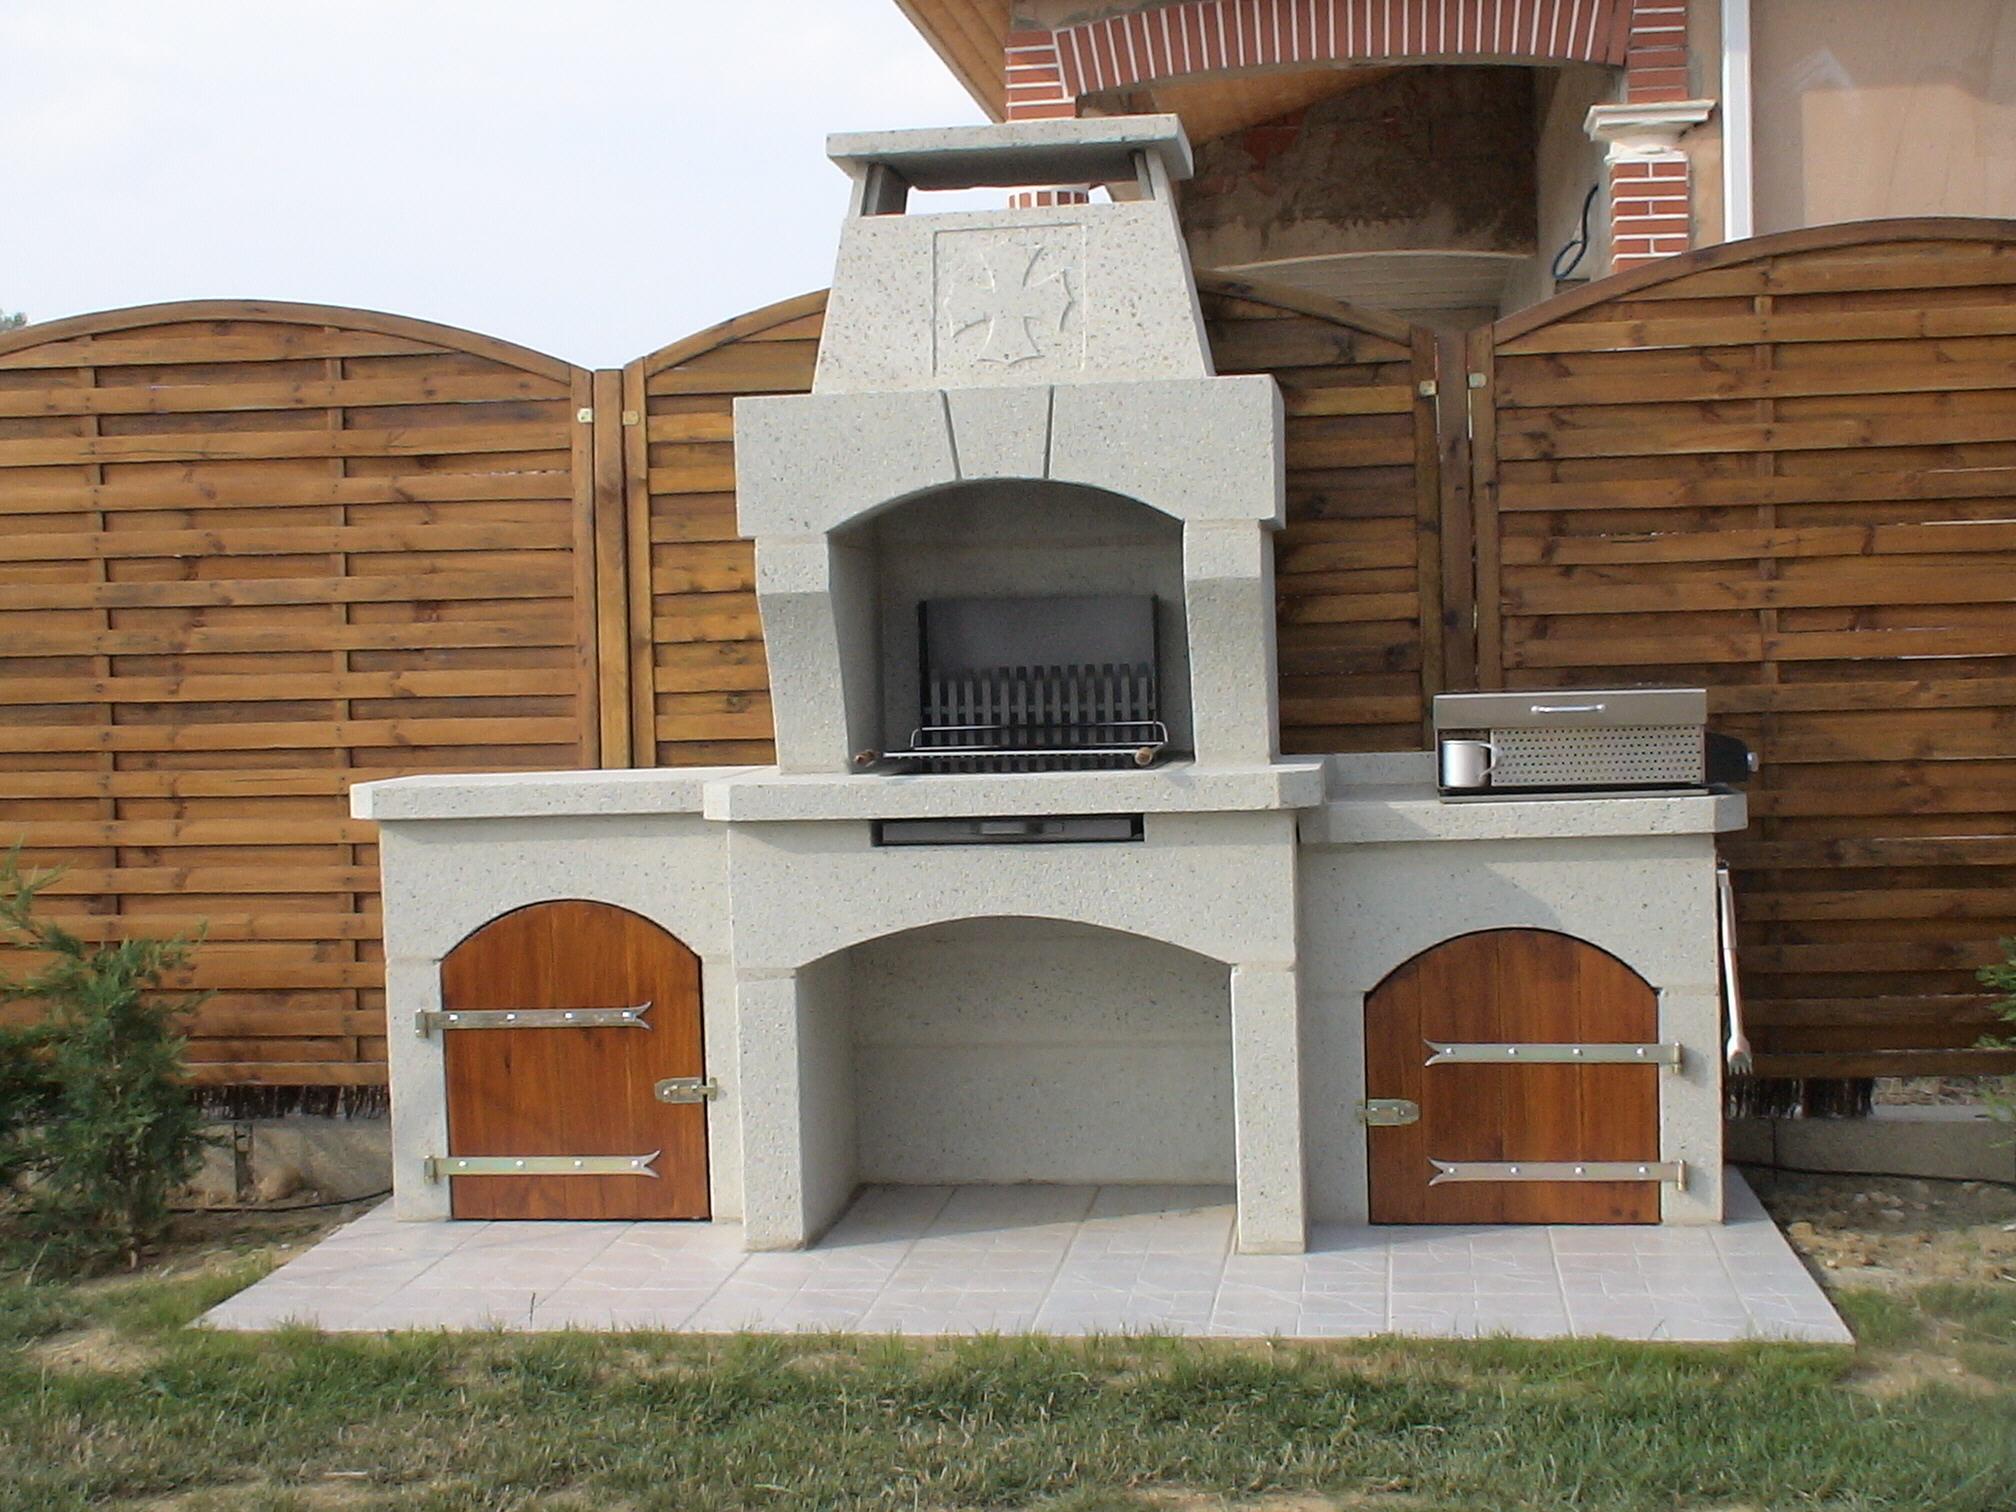 photo de barbecue exterieur. Black Bedroom Furniture Sets. Home Design Ideas